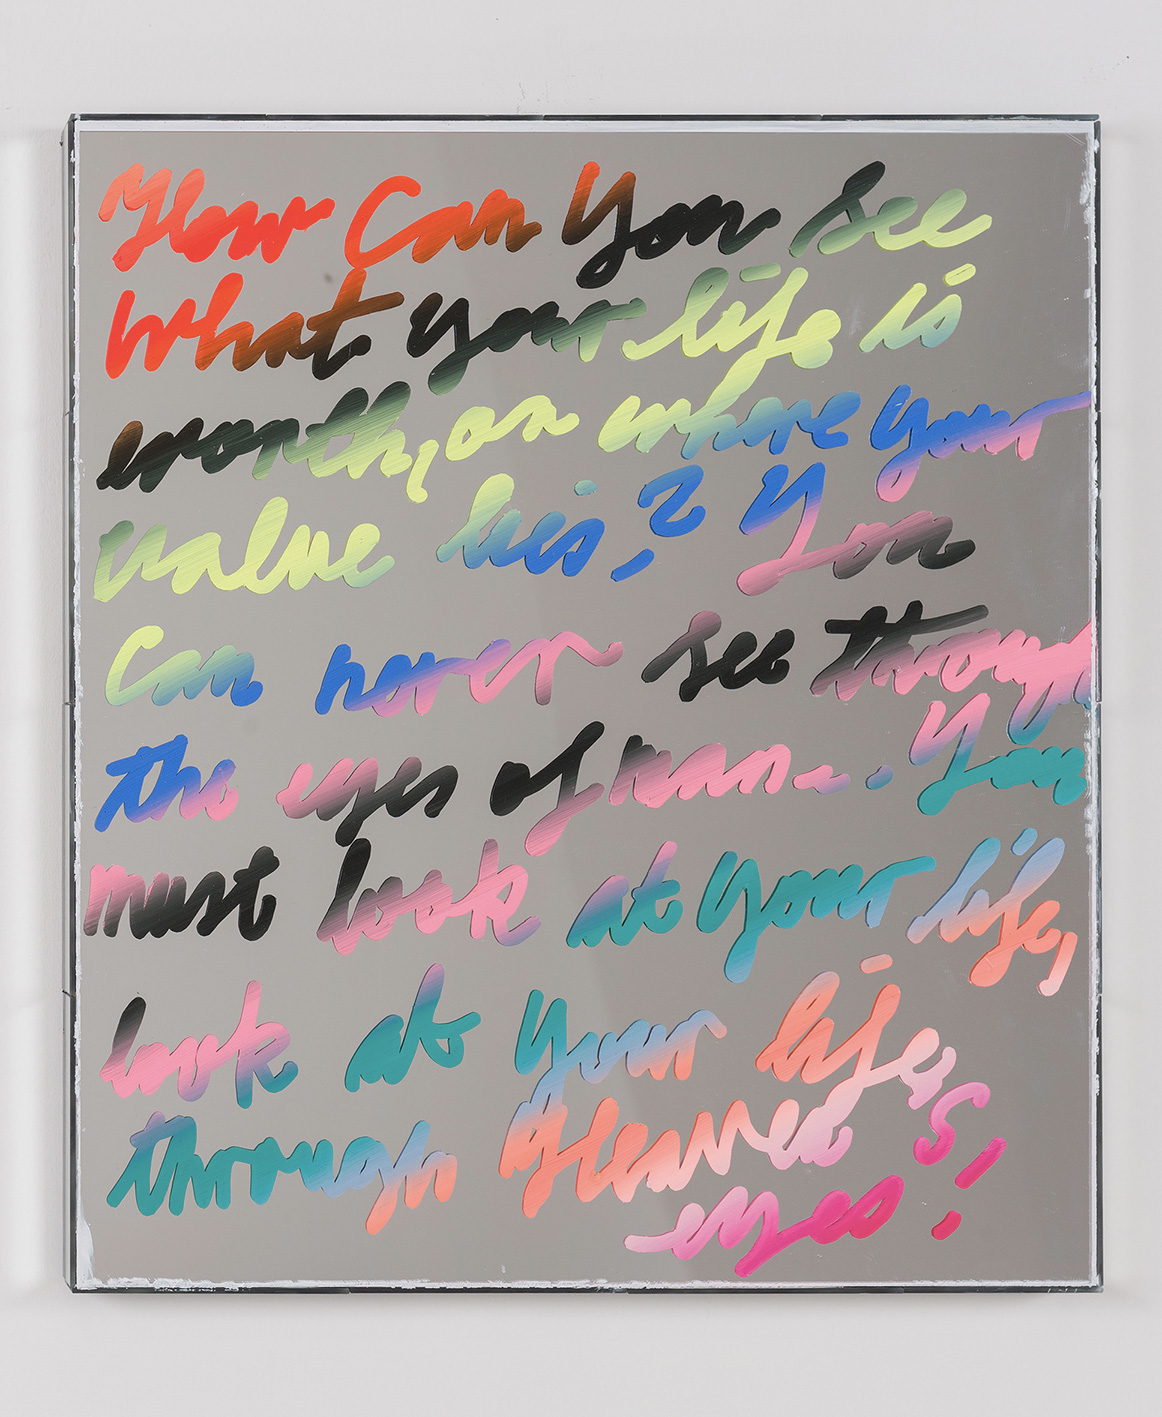 06_Lukas-Glinkowski_untititled-2021_oil-gloss-paint-acrylic-mirror-mirror-wood_60x50x35_web